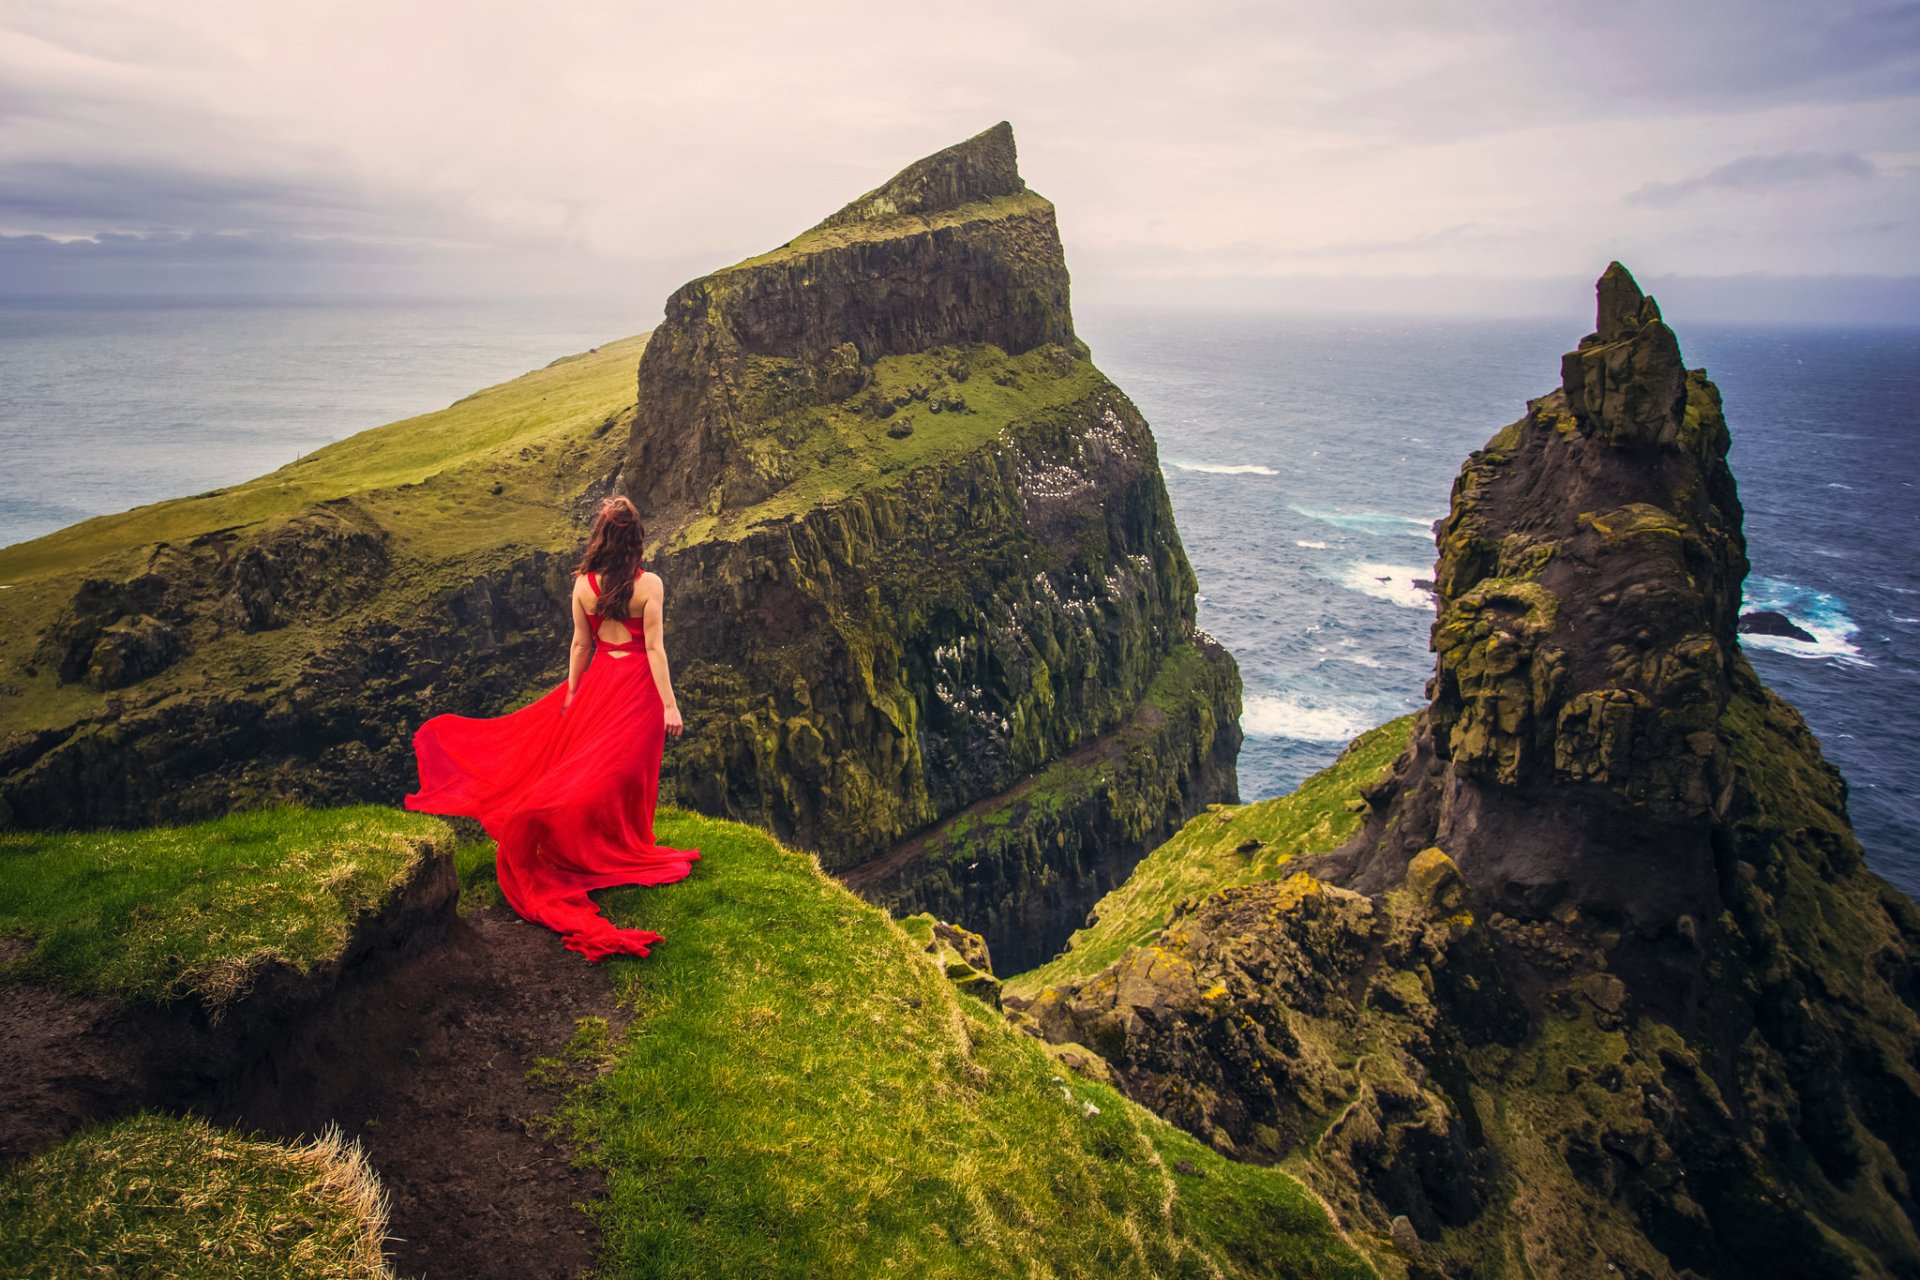 Women - Rear  Stone Horizon Woman Girl Red Dress Mountain Cliff Ocean Sea Wallpaper